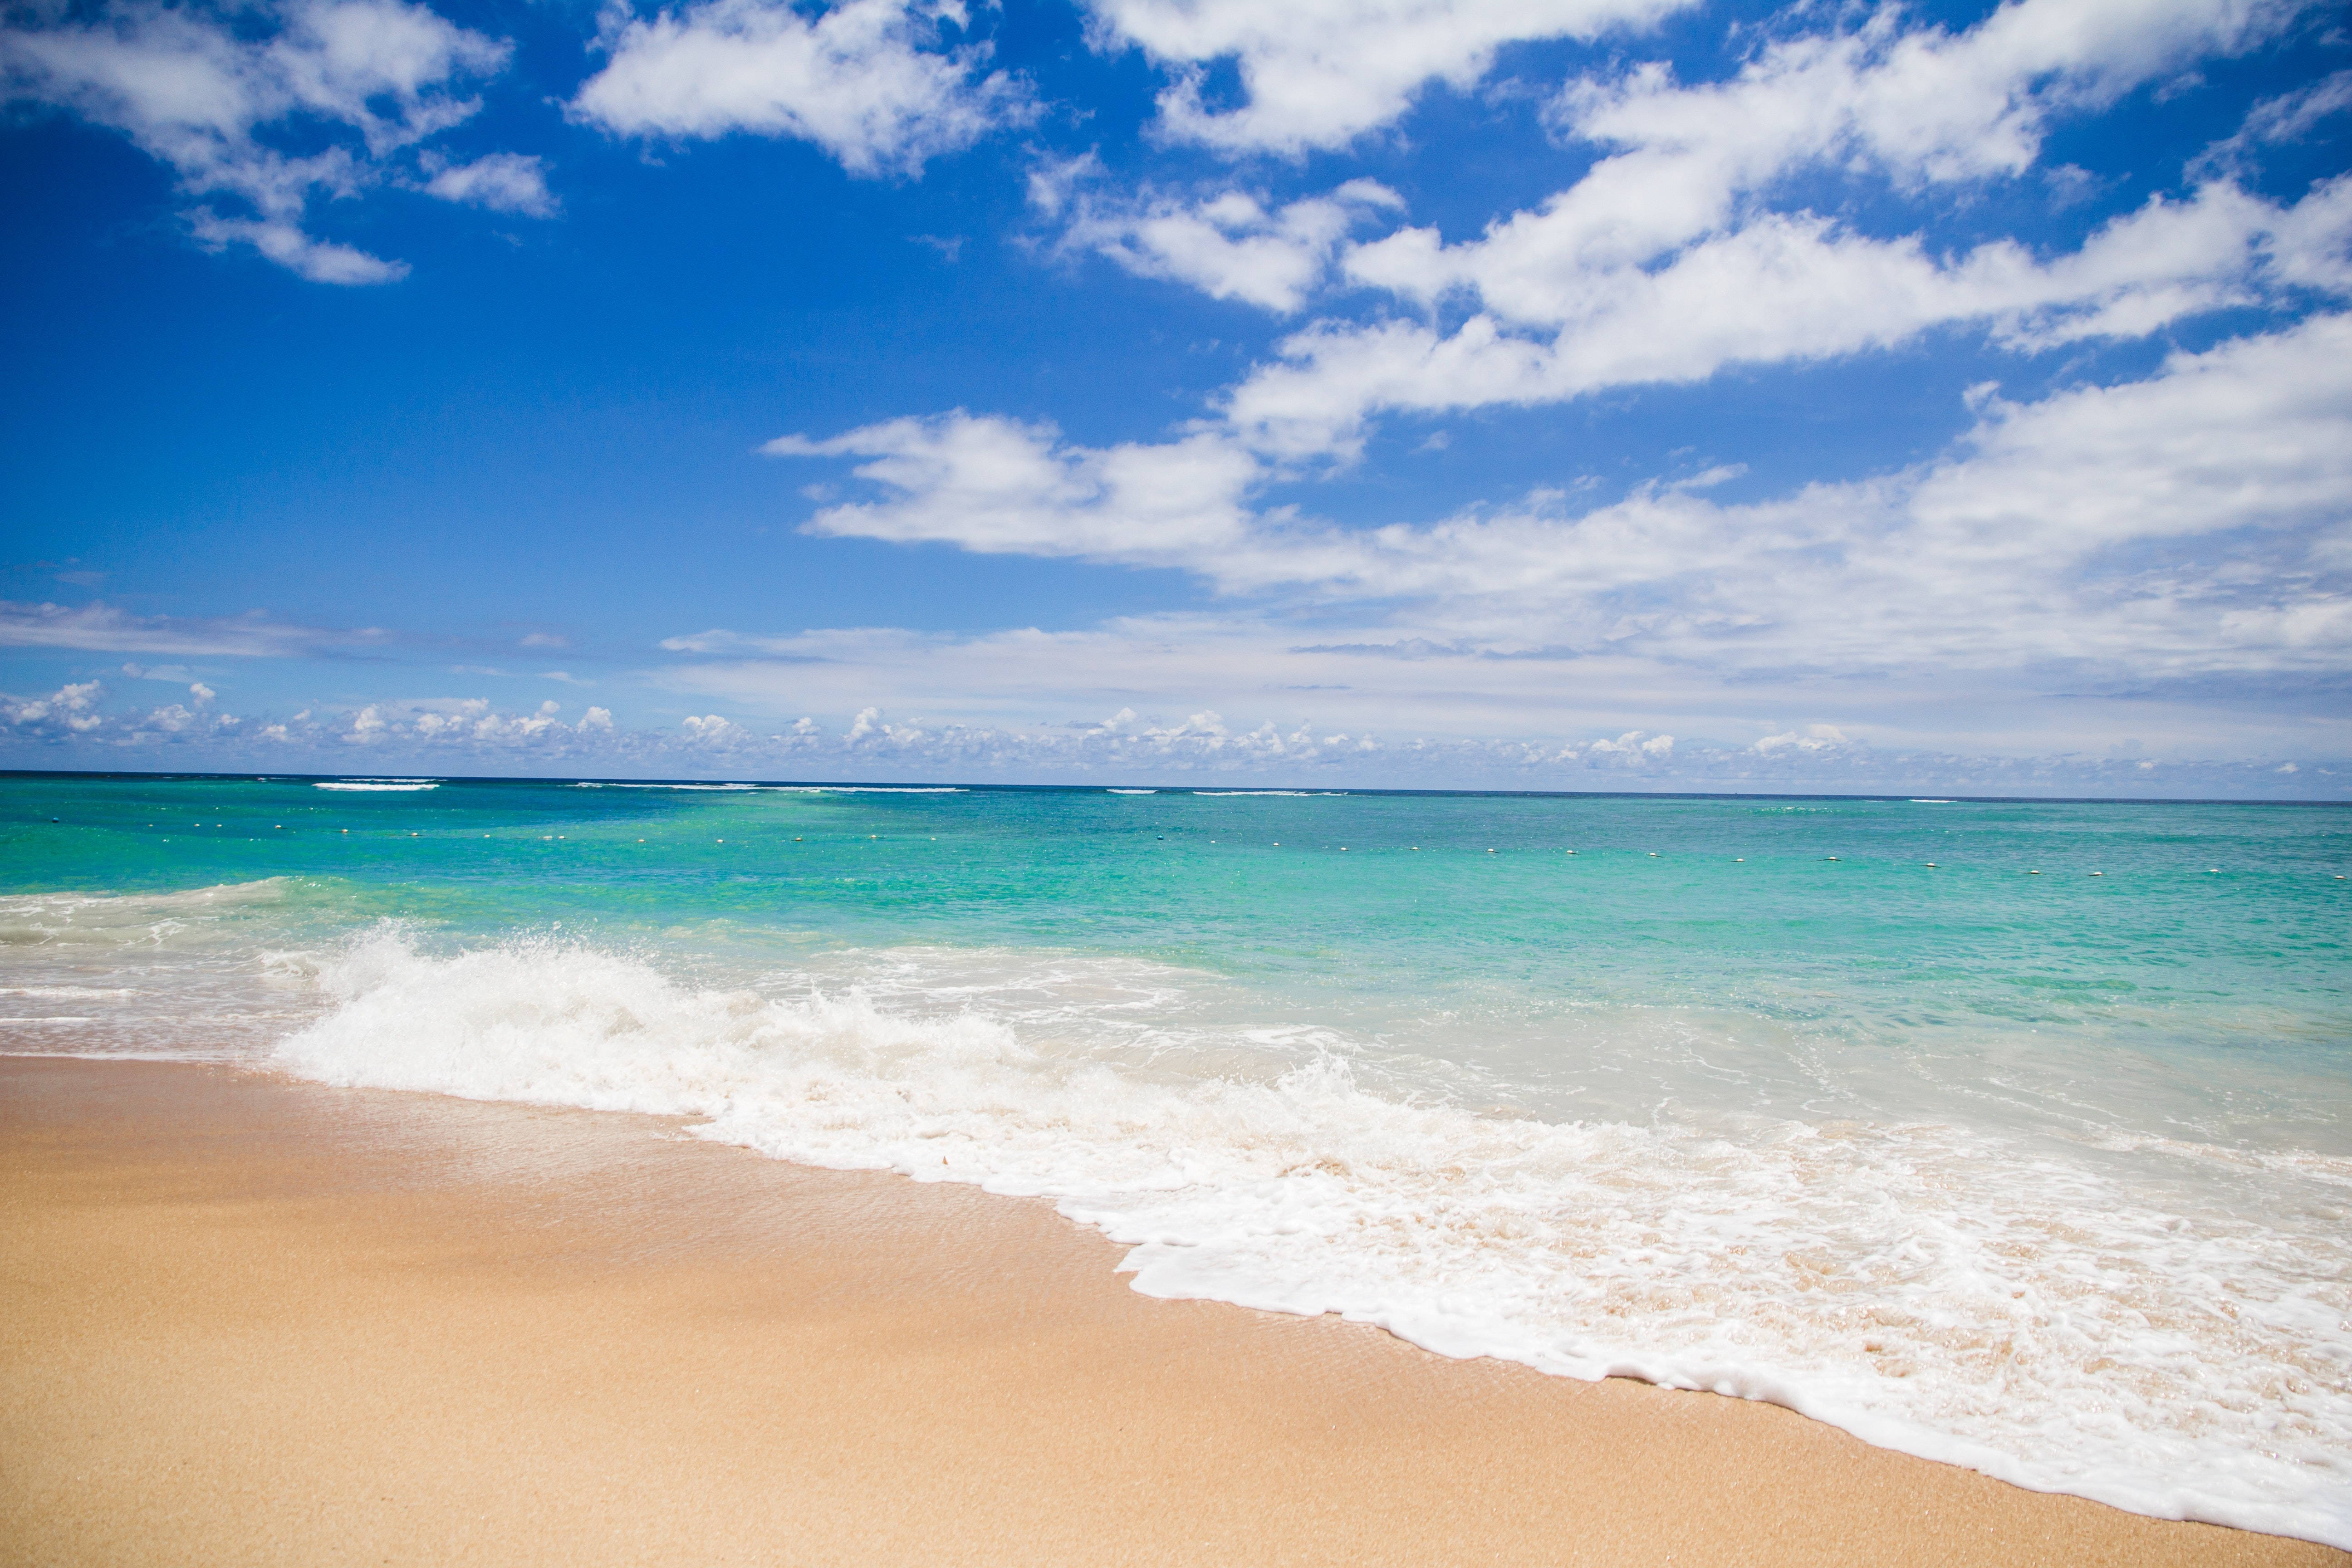 Custom 3d Photo Wallpaper Hd Maldives Sea Beach Natural: Free Stock Photo Of Background, Beach, Beautiful